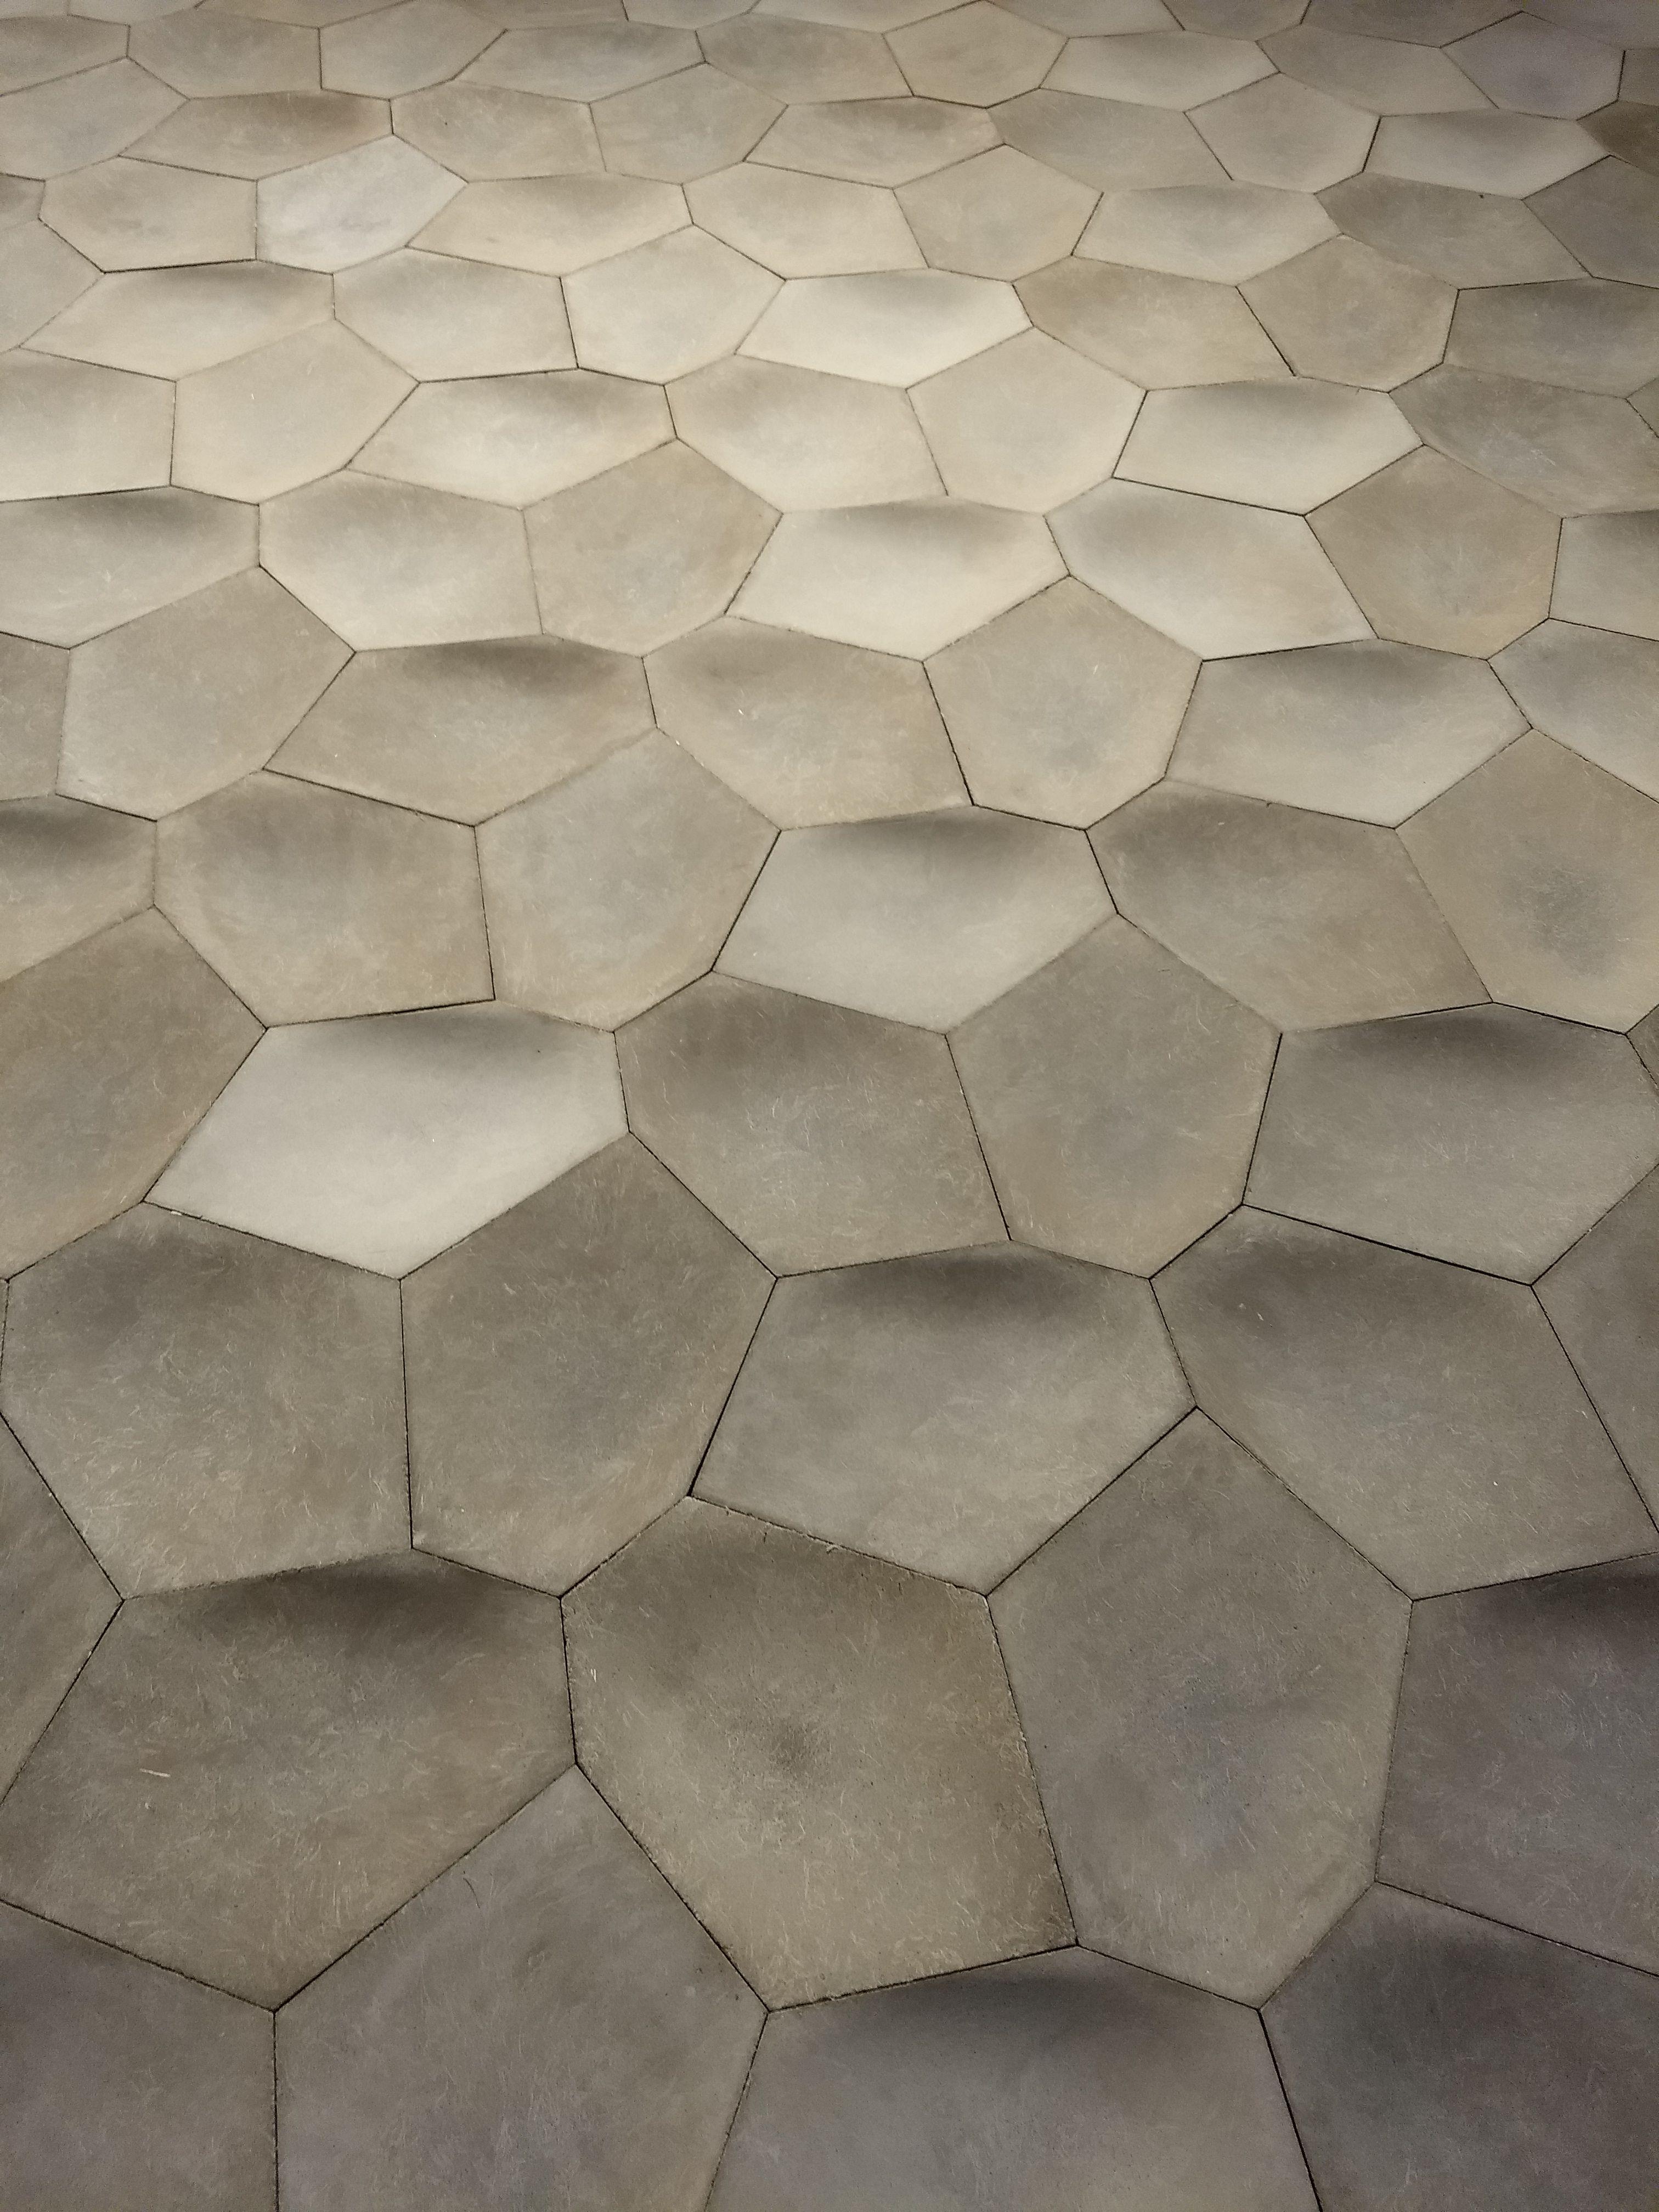 Criaterra Hex Earth Tiles Innovation Technology Three Dimensional Circular Economy